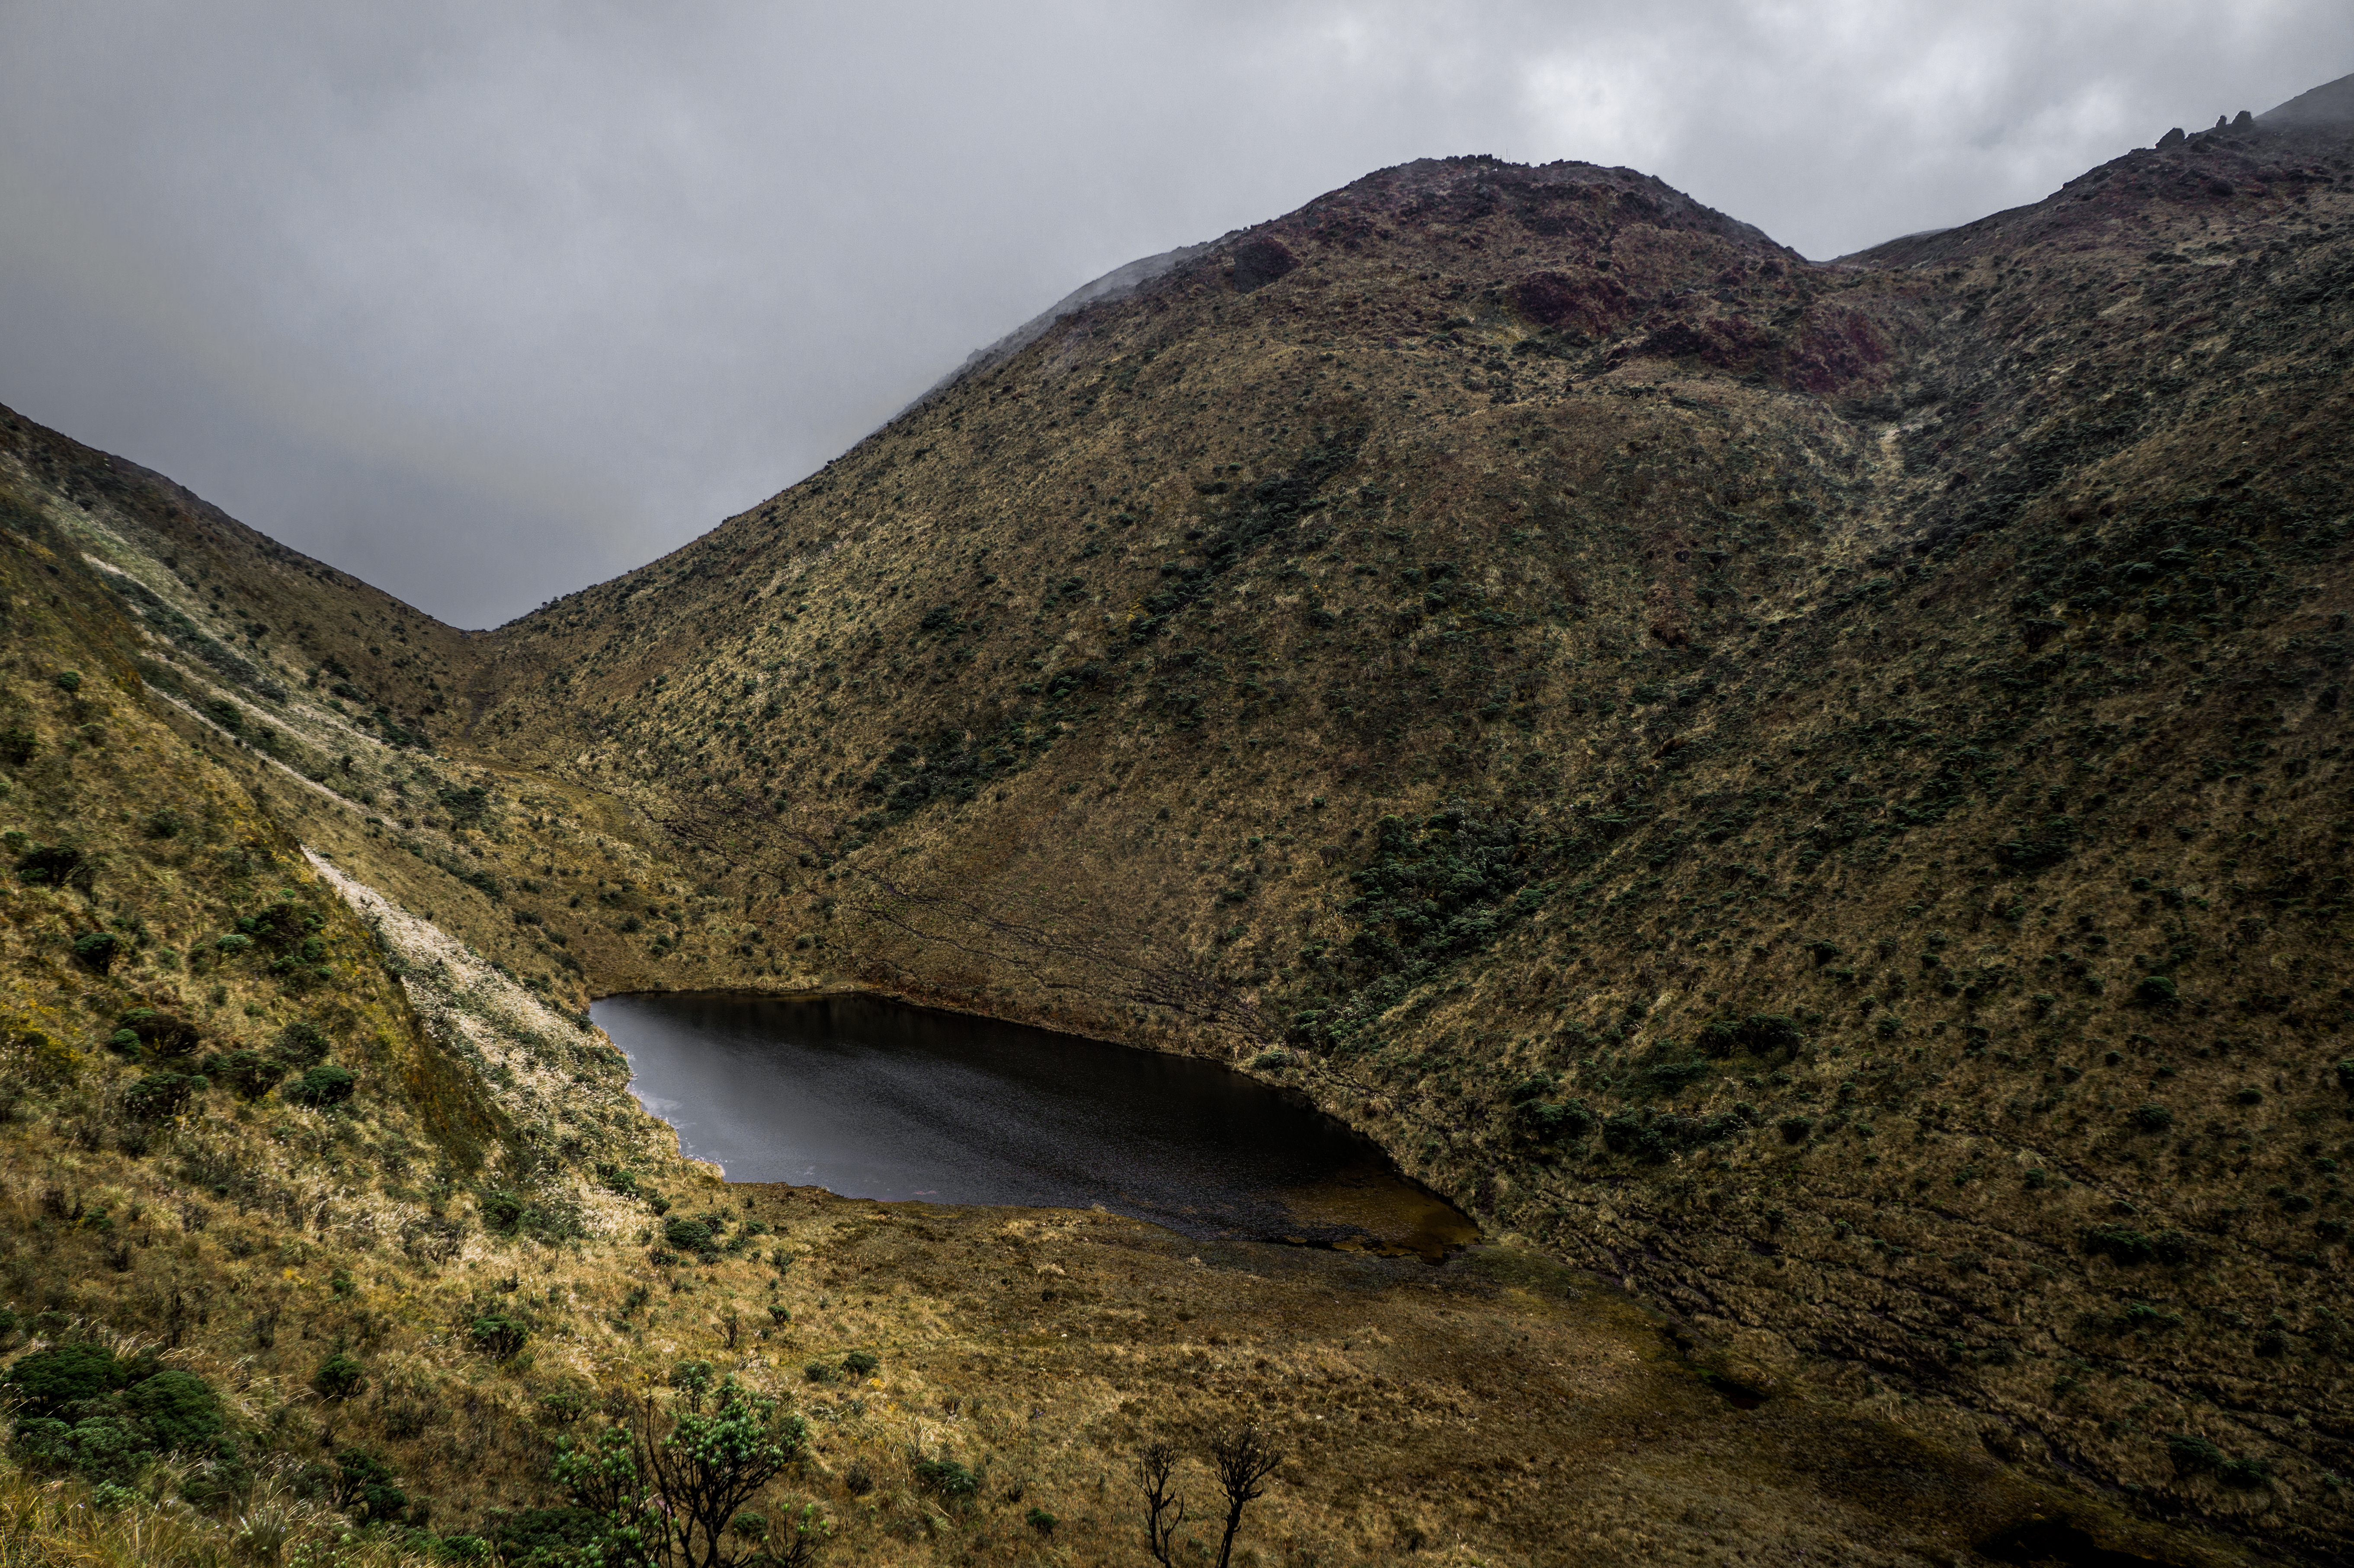 File:Laguna Negra - Volcan Azufral.jpg - Wikimedia Commons